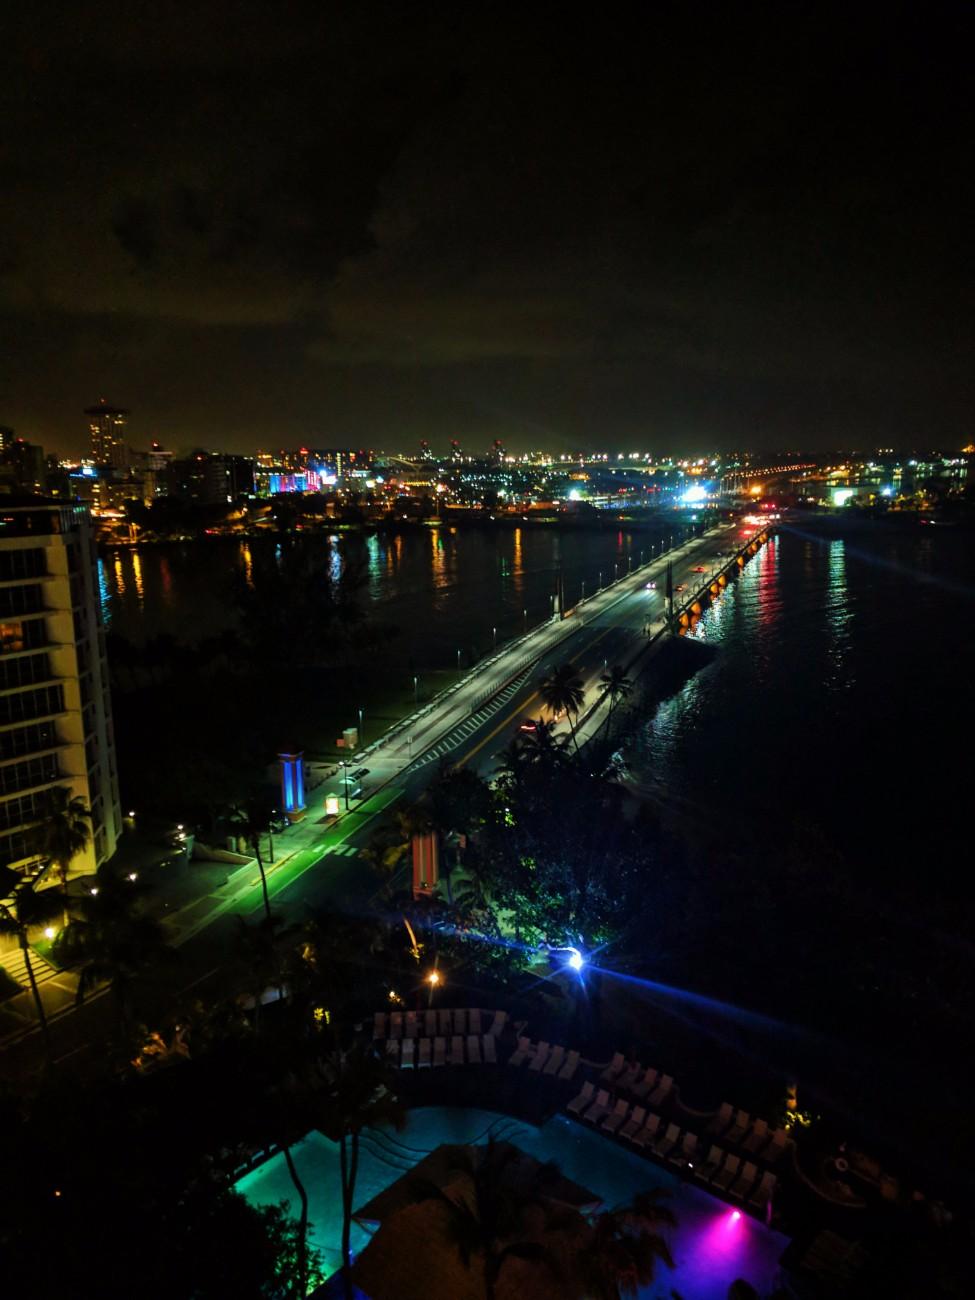 View-from-Condado-Plaza-Hilton-San-Juan-Puerto-Rico-at-night-1.jpg